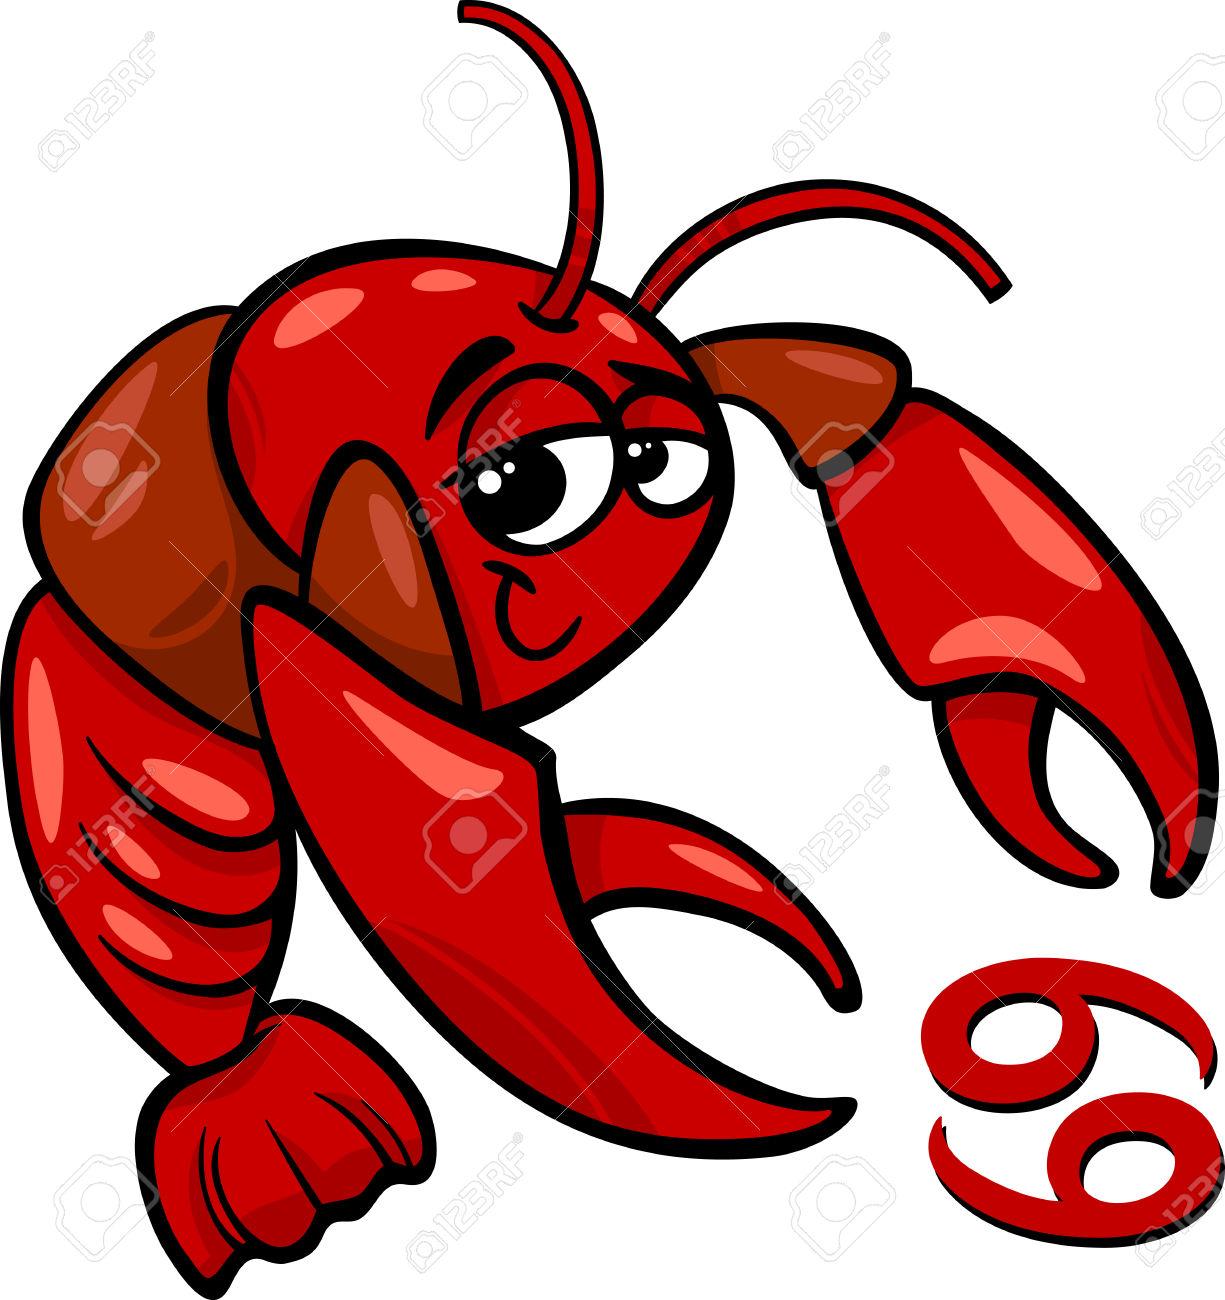 1225x1300 Crawfish Stock Illustrations, Cliparts And Royalty Free Crawfish